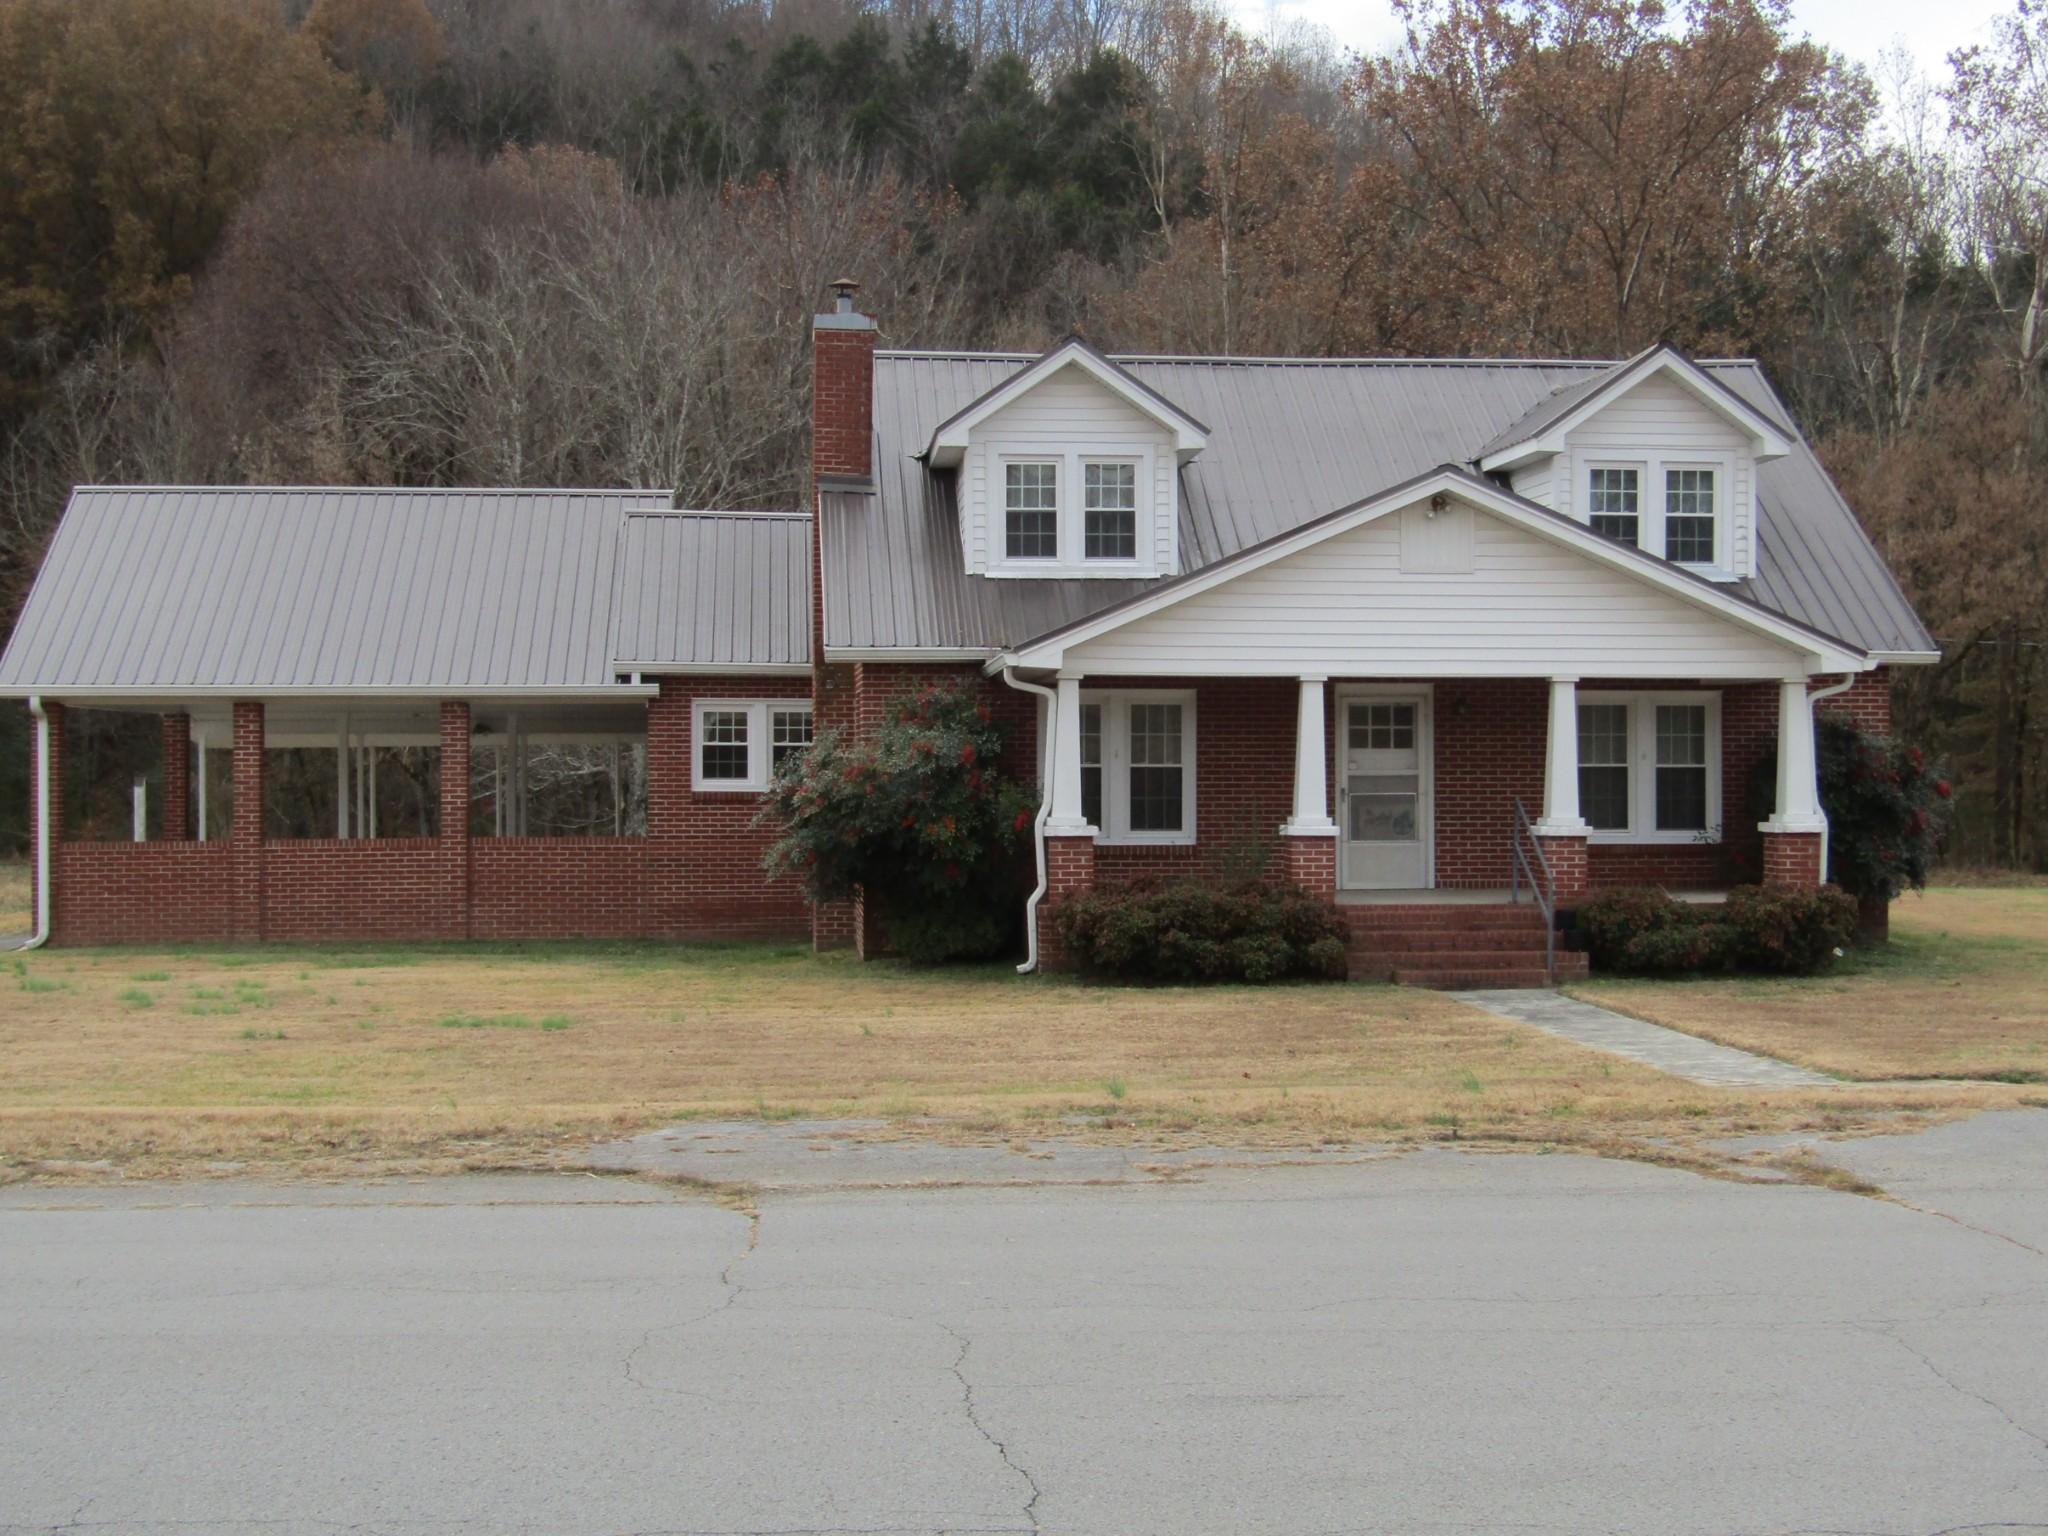 559 French Brantley Rd, Wartrace, TN 37183 - Wartrace, TN real estate listing